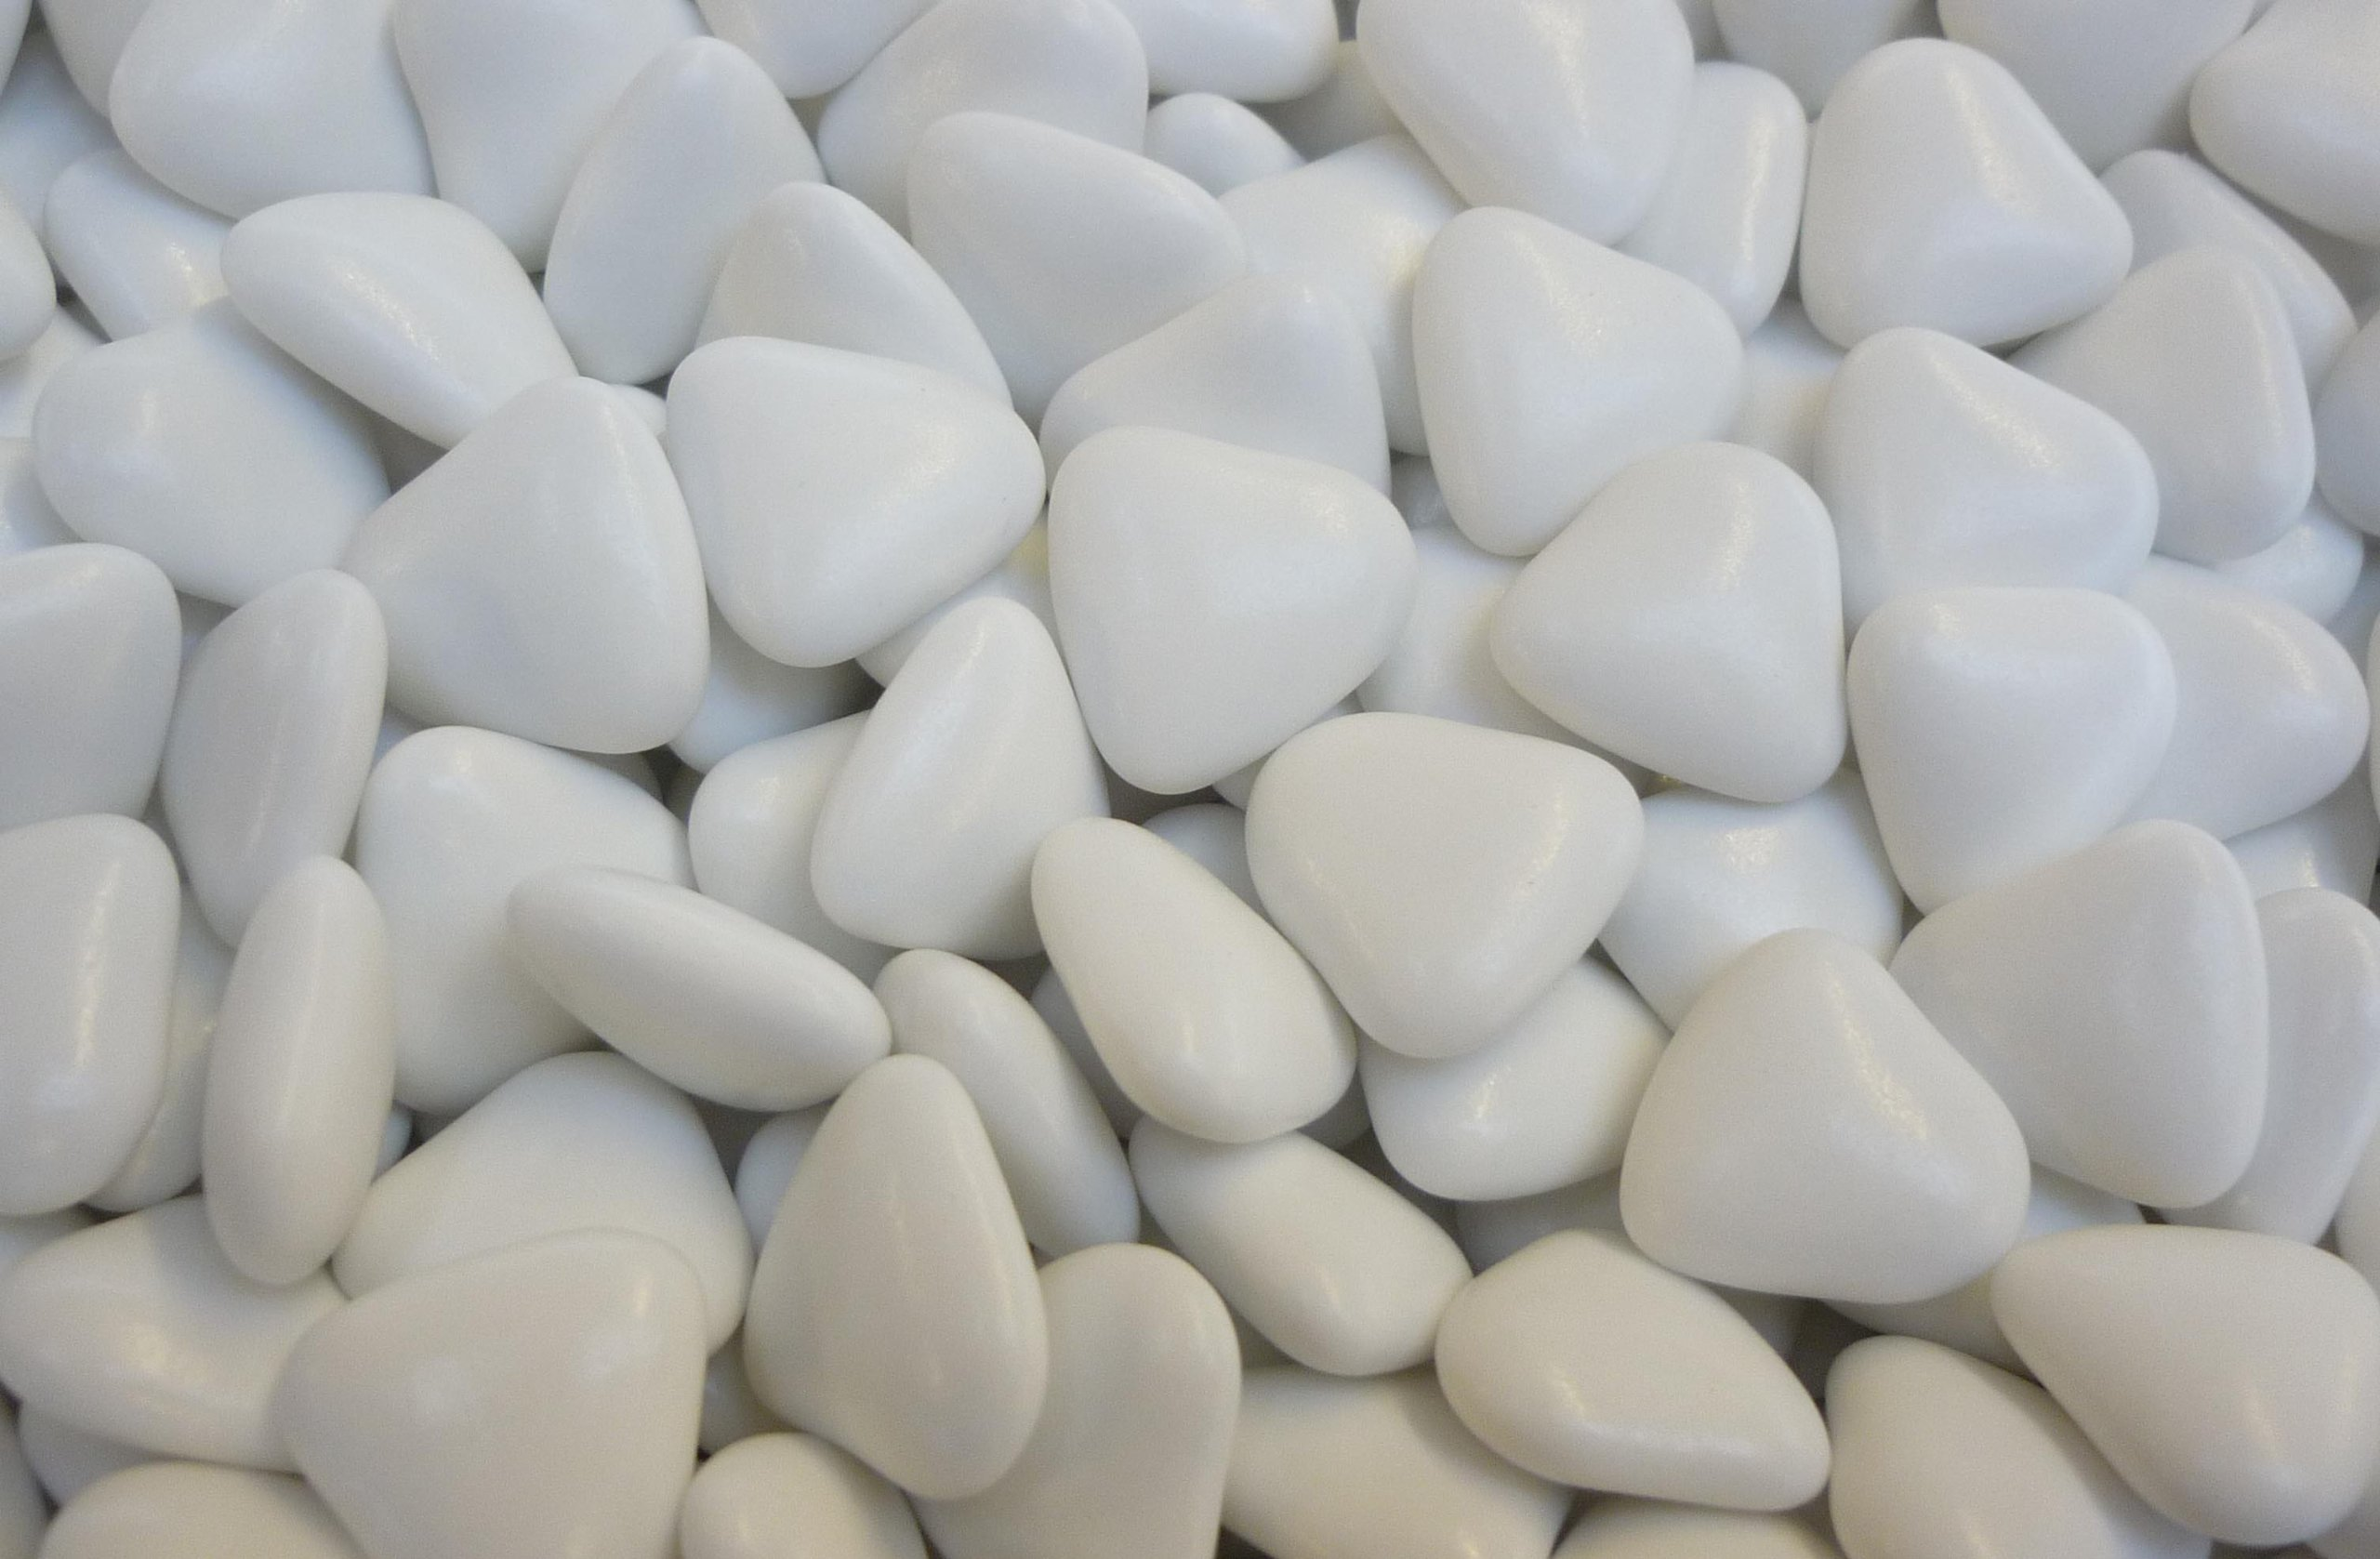 Italian Options Mini White Heart Chocolate Dragees 1 Kilo Box